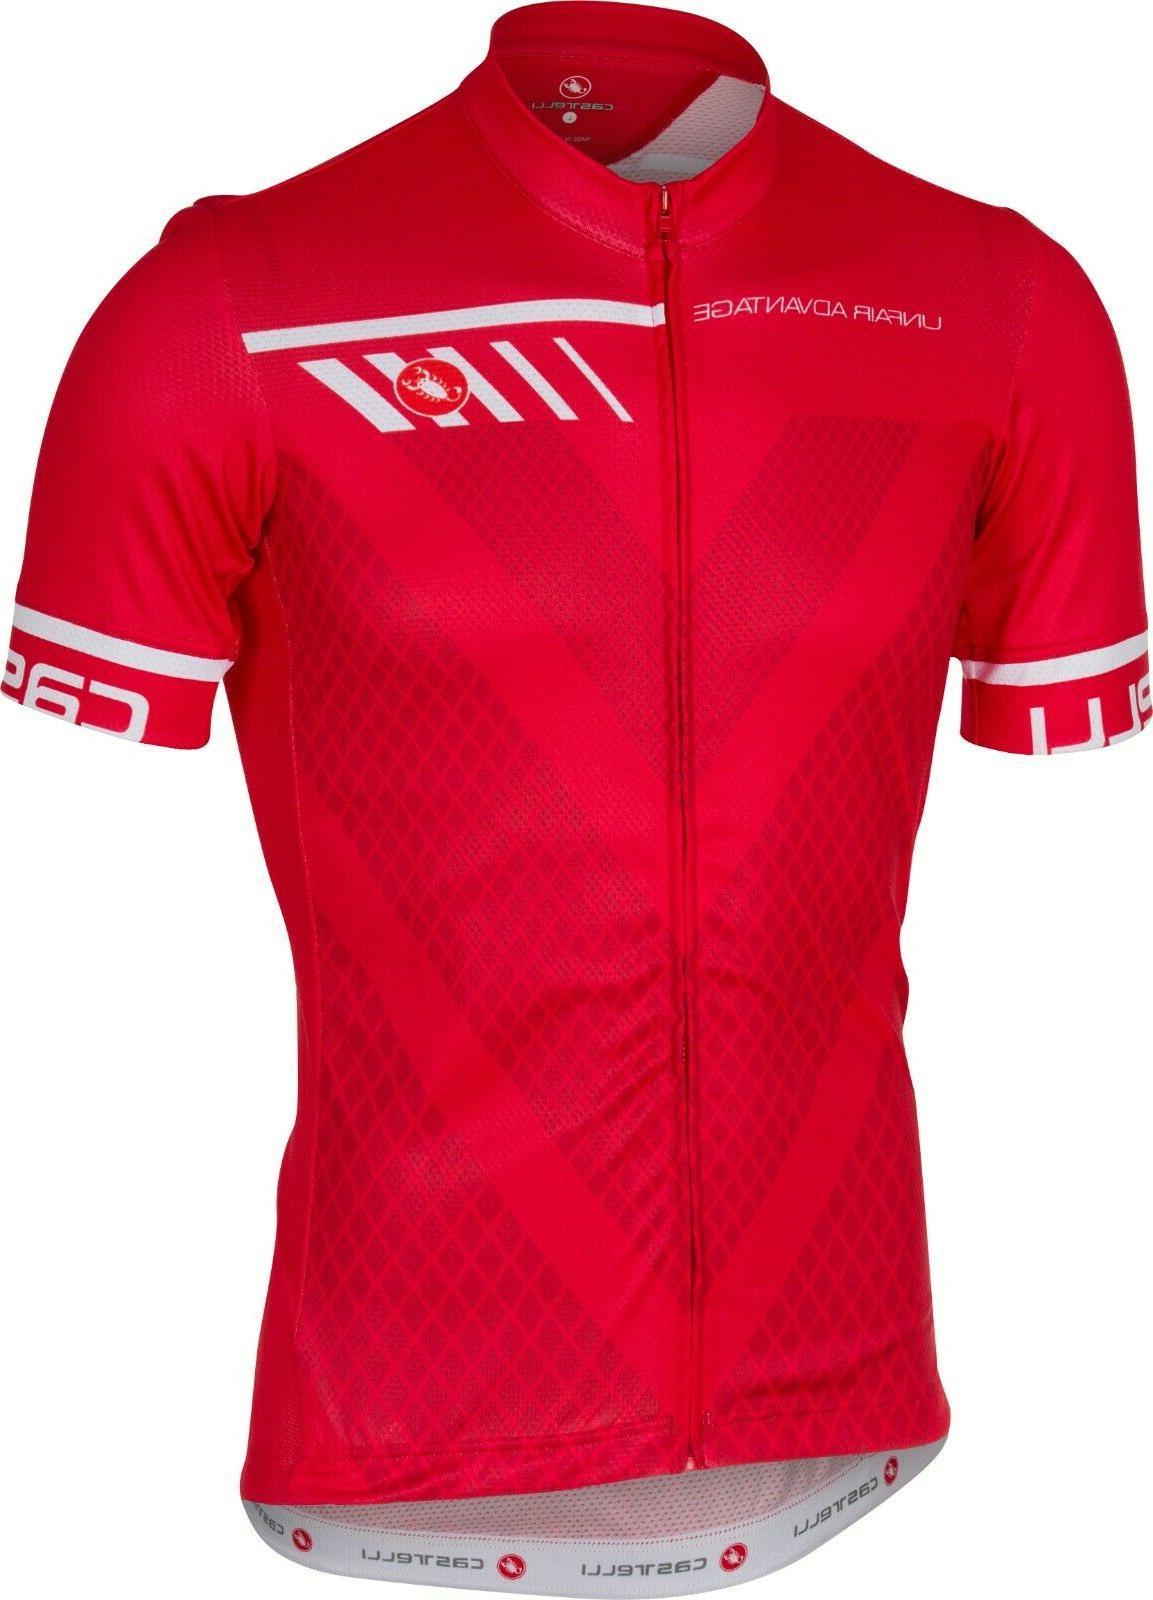 Castelli Velocissimo Men's Jersey Red Large : Best Buy